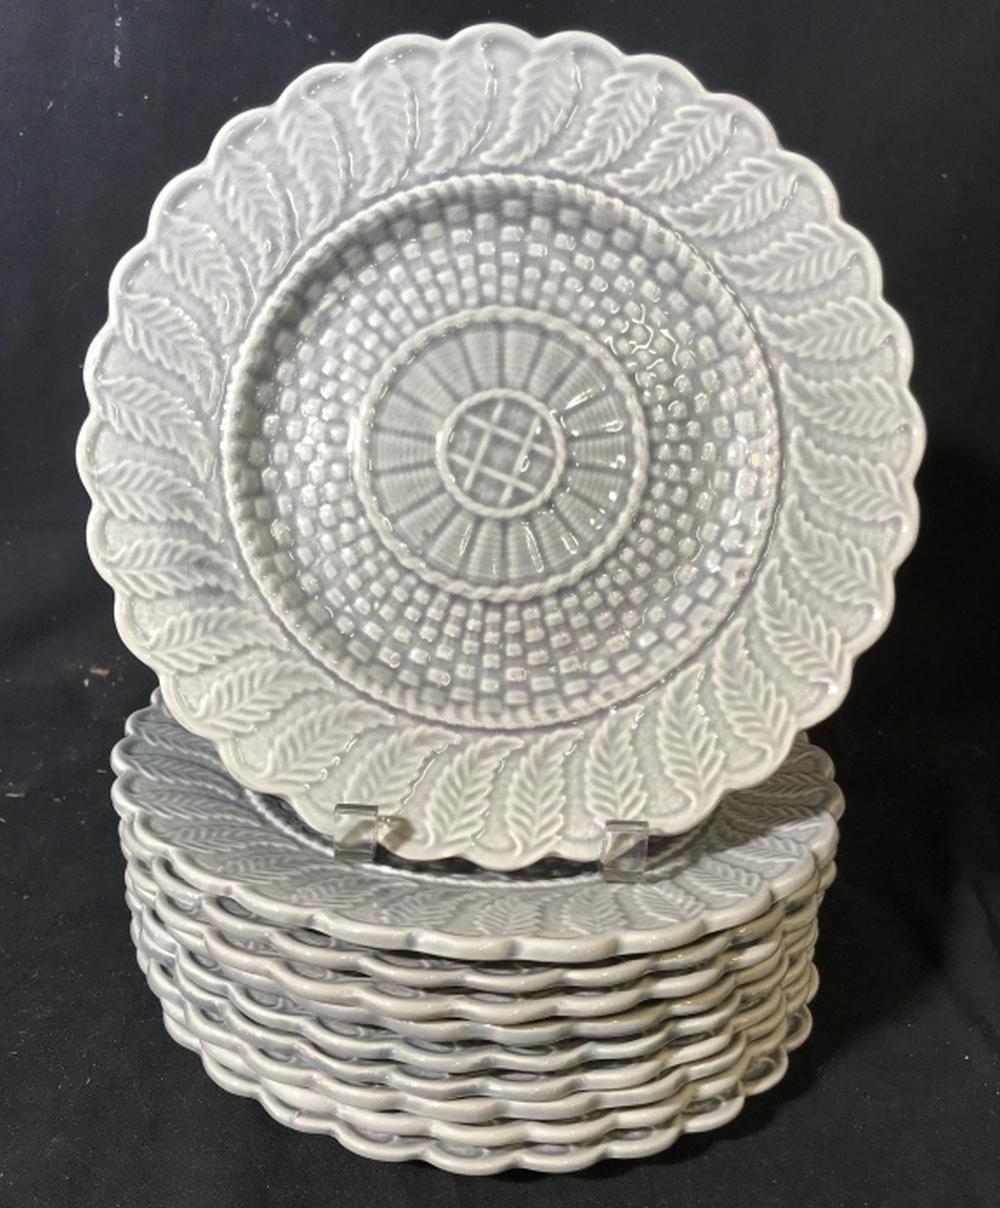 Set 10 Signed Gray Toned Plates